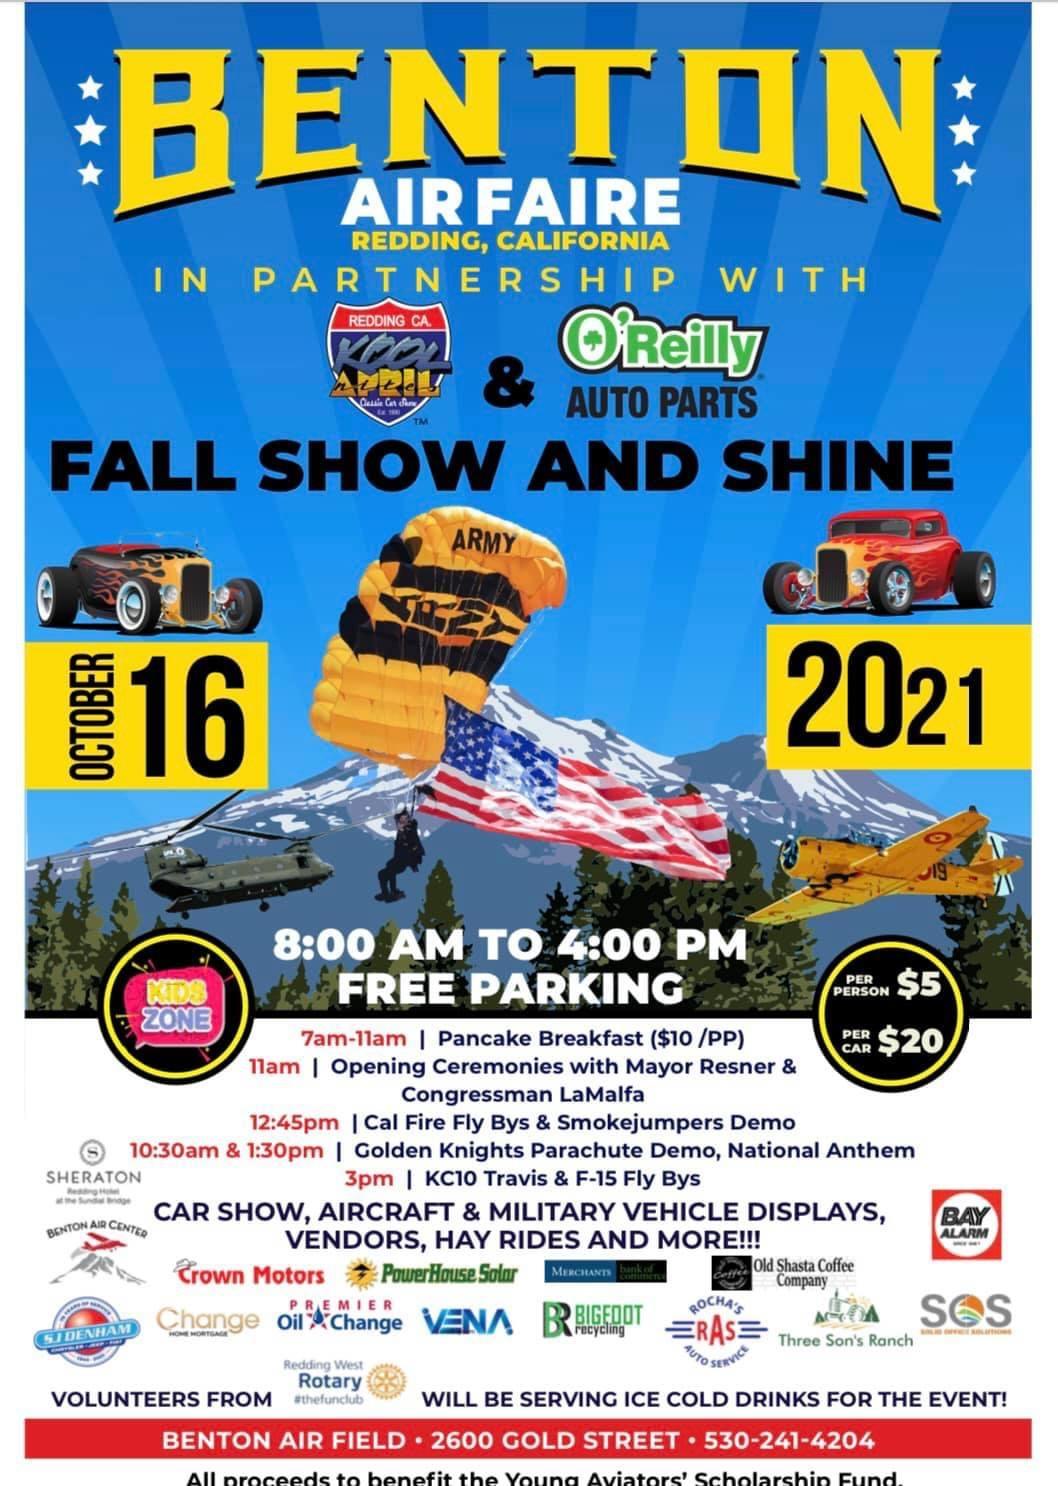 Benton Air Faire Car Show